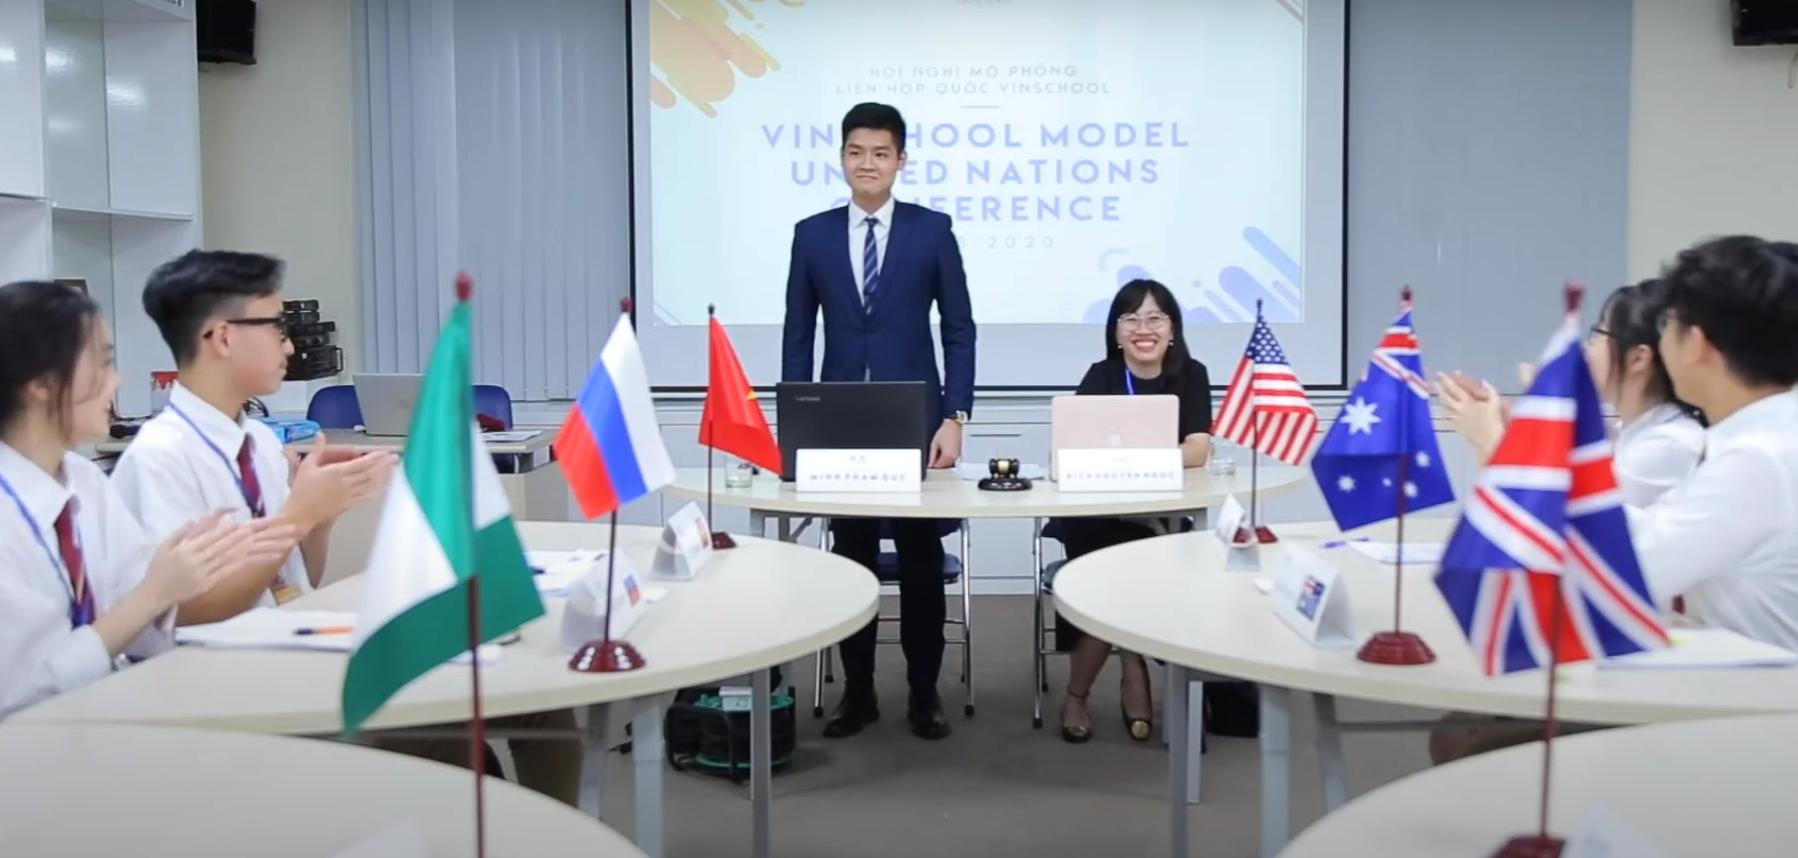 VINMUN 2020 – Vinschool Model United Nations